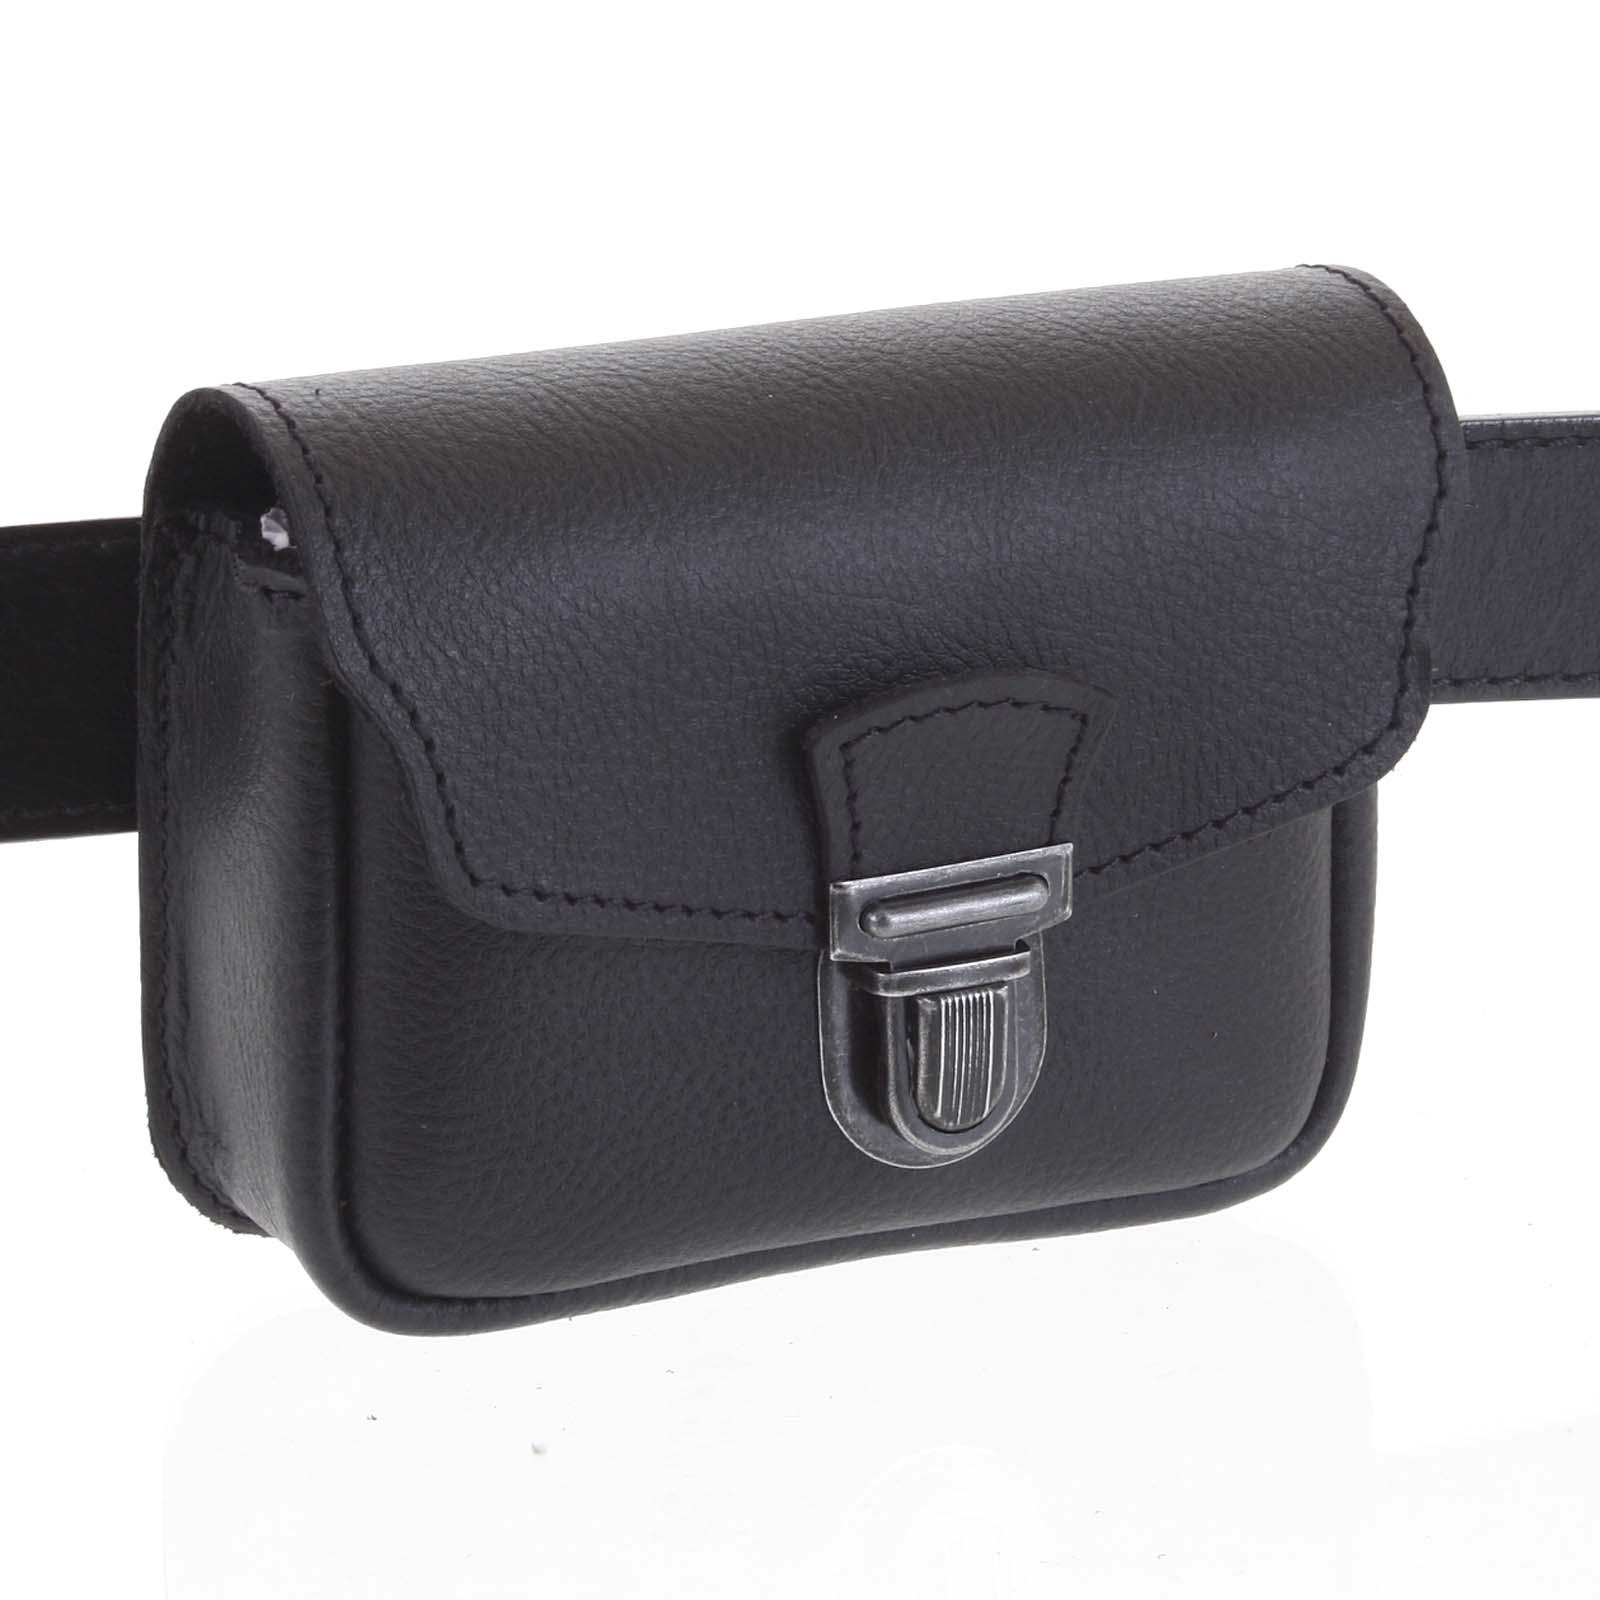 Pánská kožená kapsa na opasek černá - Kabea Simplex